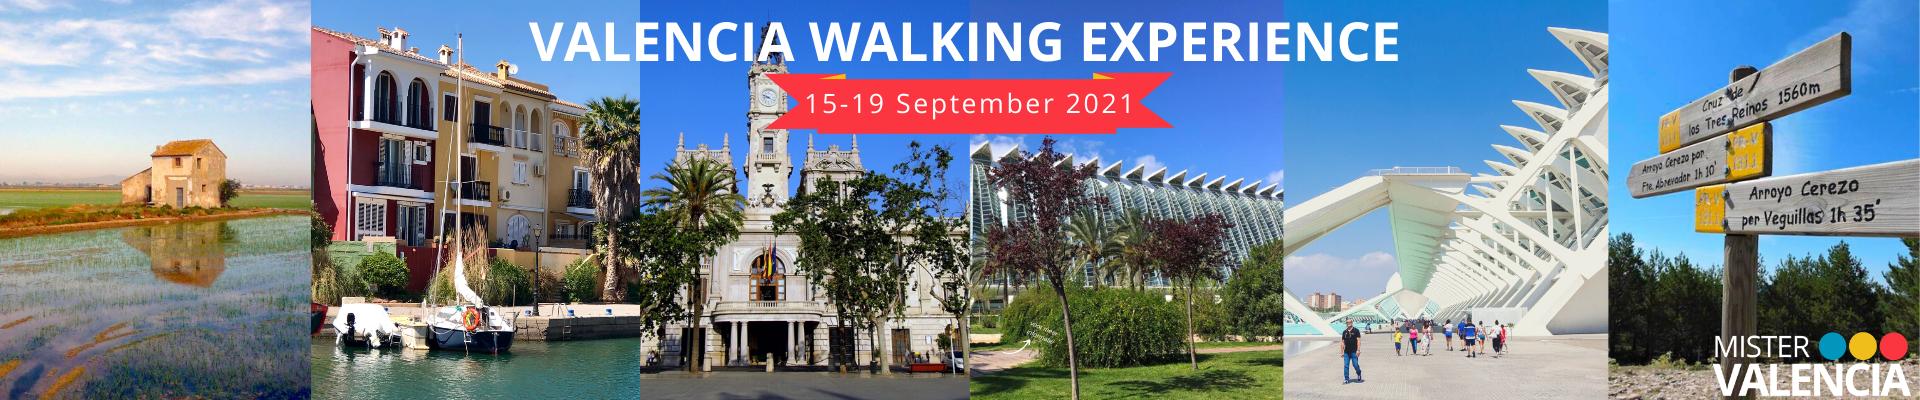 Valencia Walking Experience Mei 2021 (English)